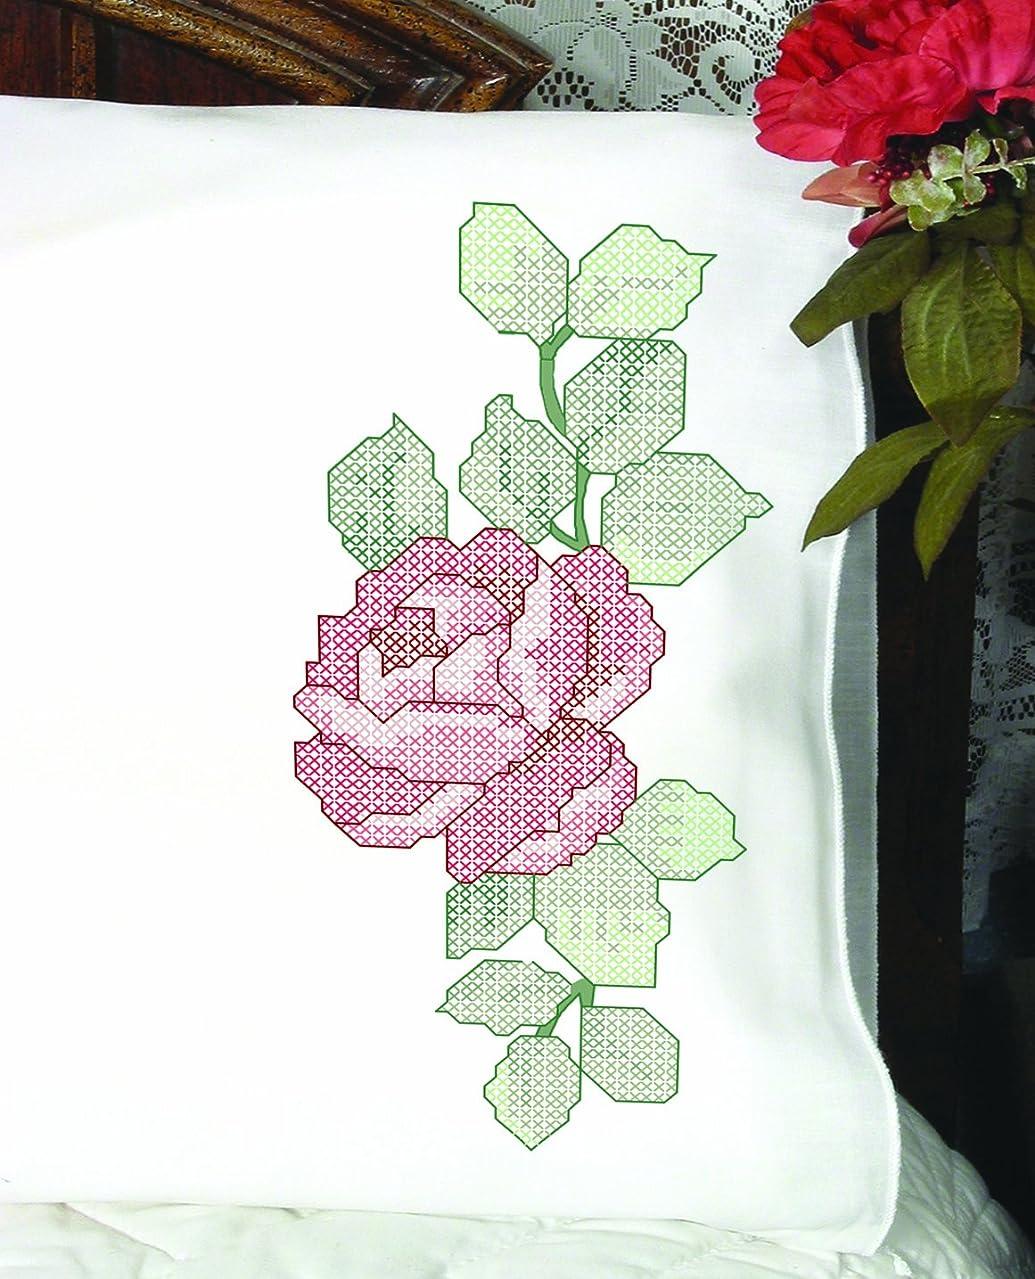 Fairway Needlecraft 83216 Cross Stitch Perle Edge Pillowcases, Large Rose Design, Standard, White